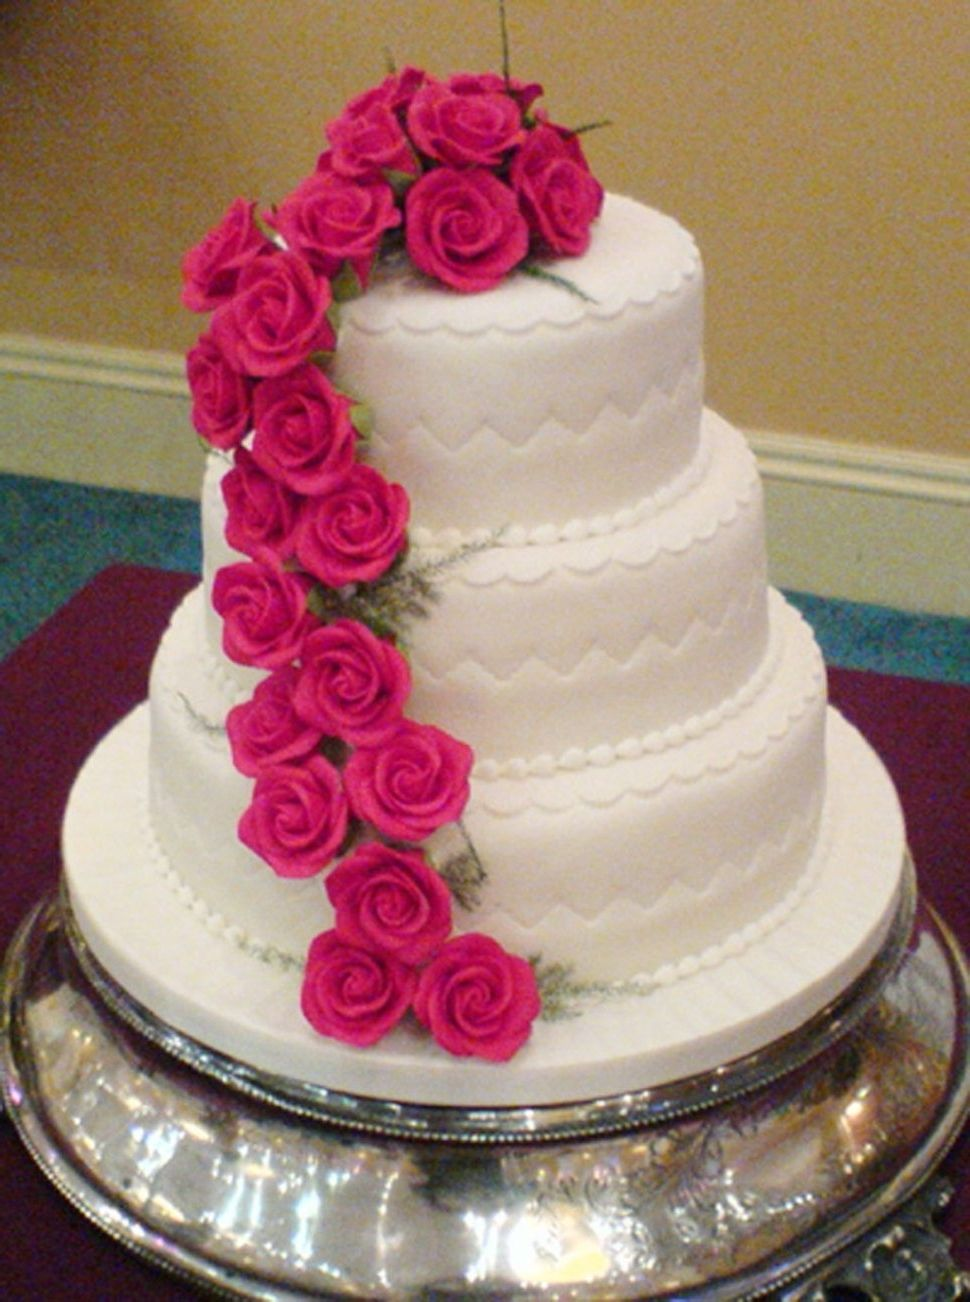 Wedding Cakes Perth Scotland Wedding cakes with flowers